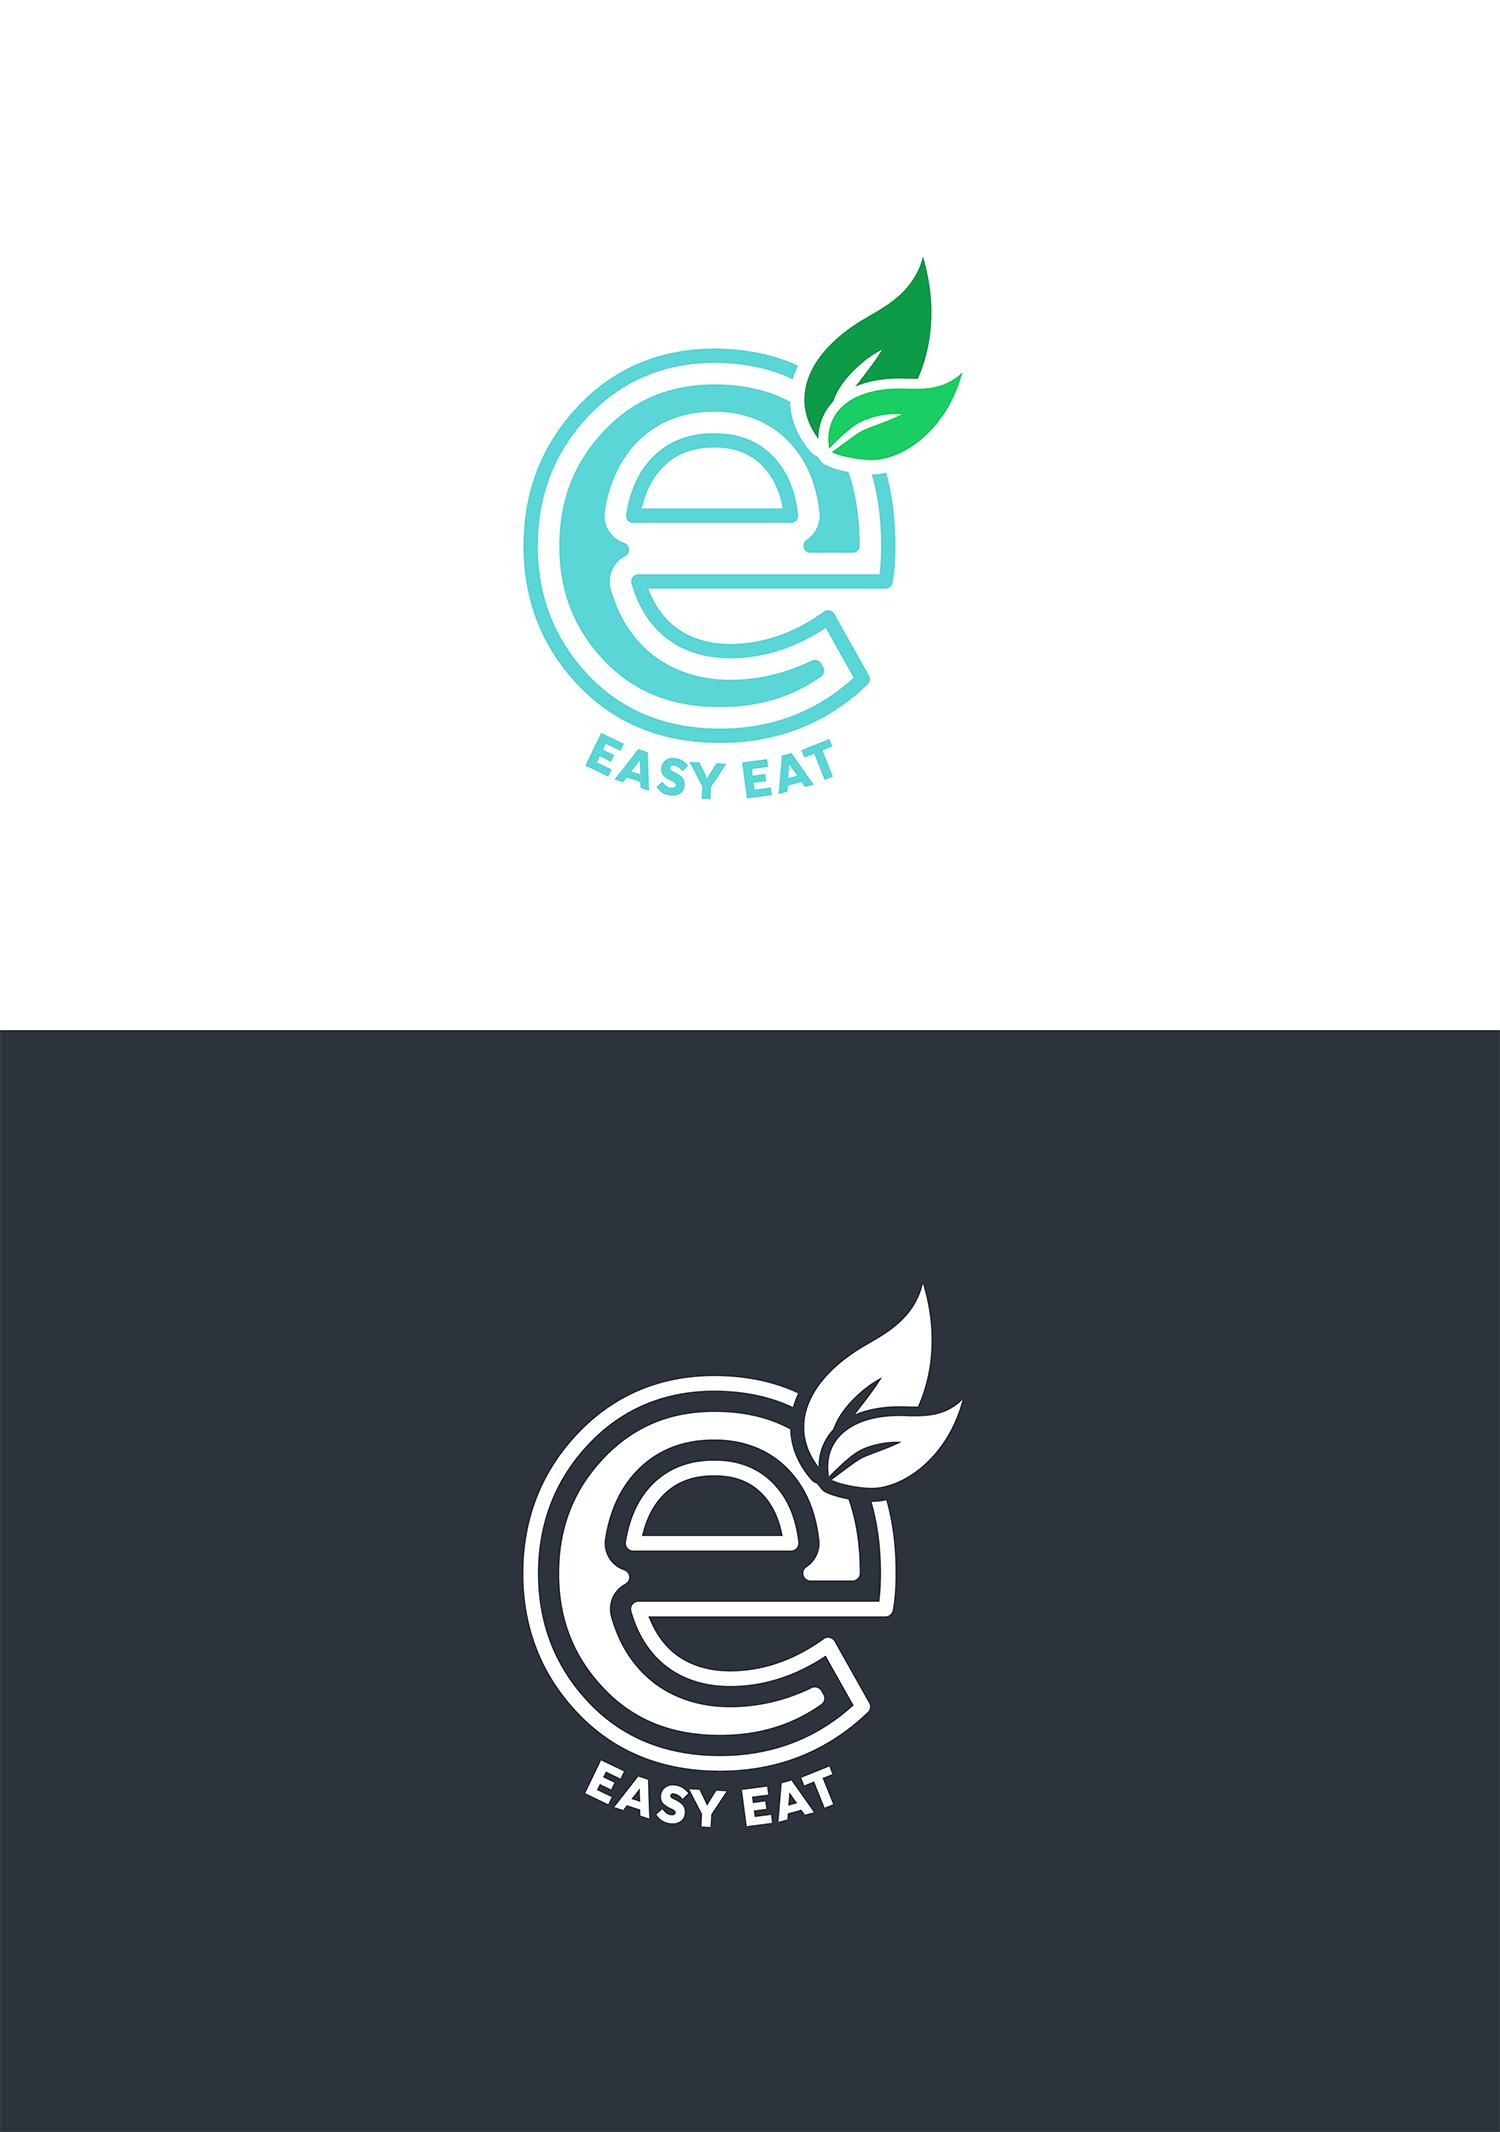 Дизайн логотипа, новое название фото f_2605afd689de89b6.png